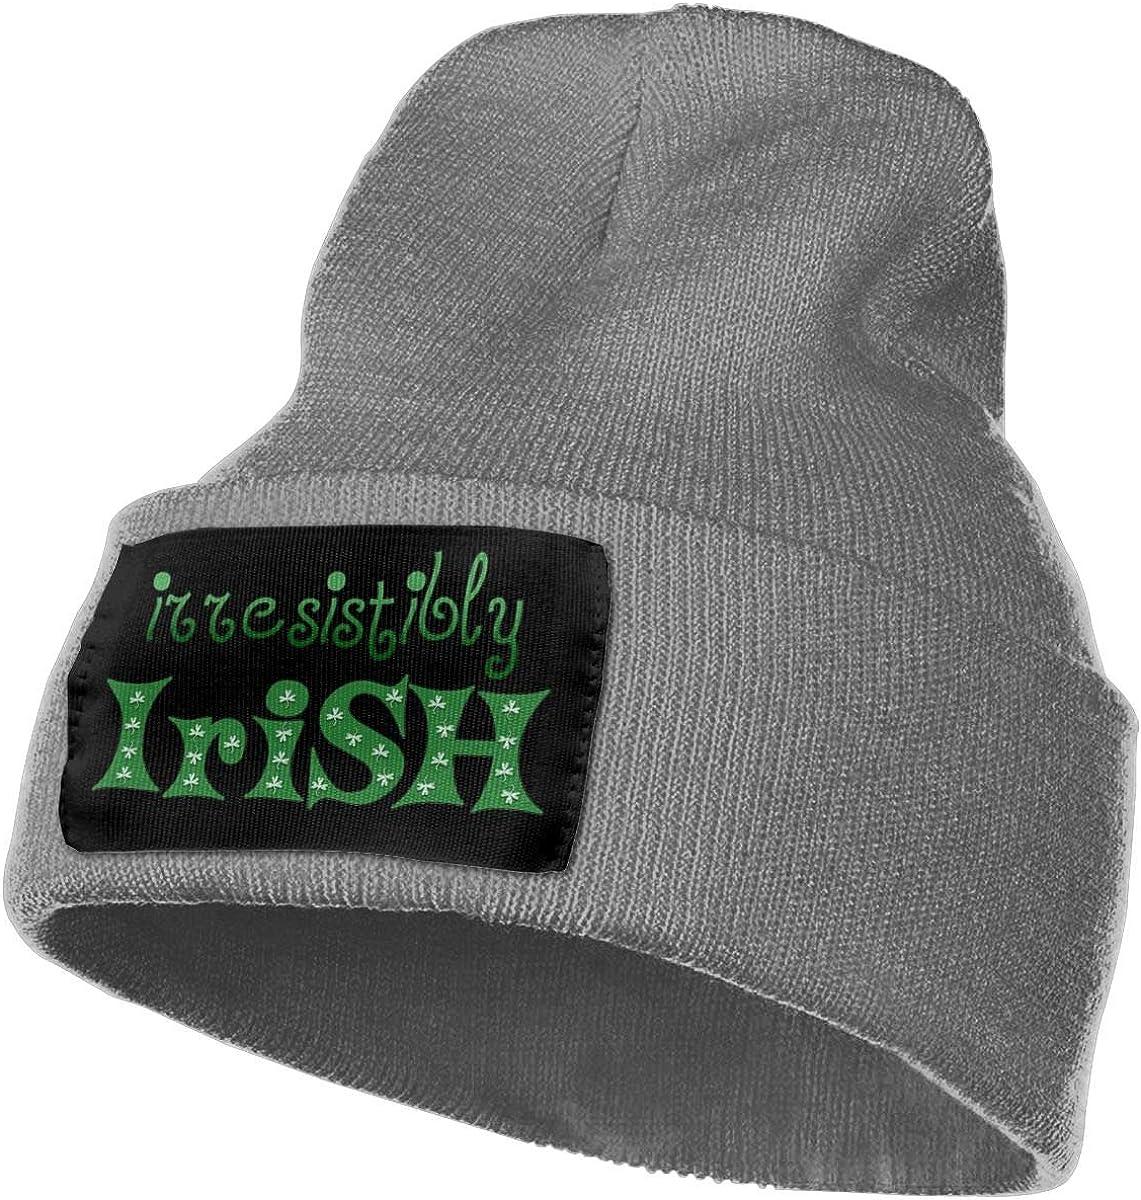 QZqDQ Irresistibly Irish Ts Unisex Fashion Knitted Hat Luxury Hip-Hop Cap